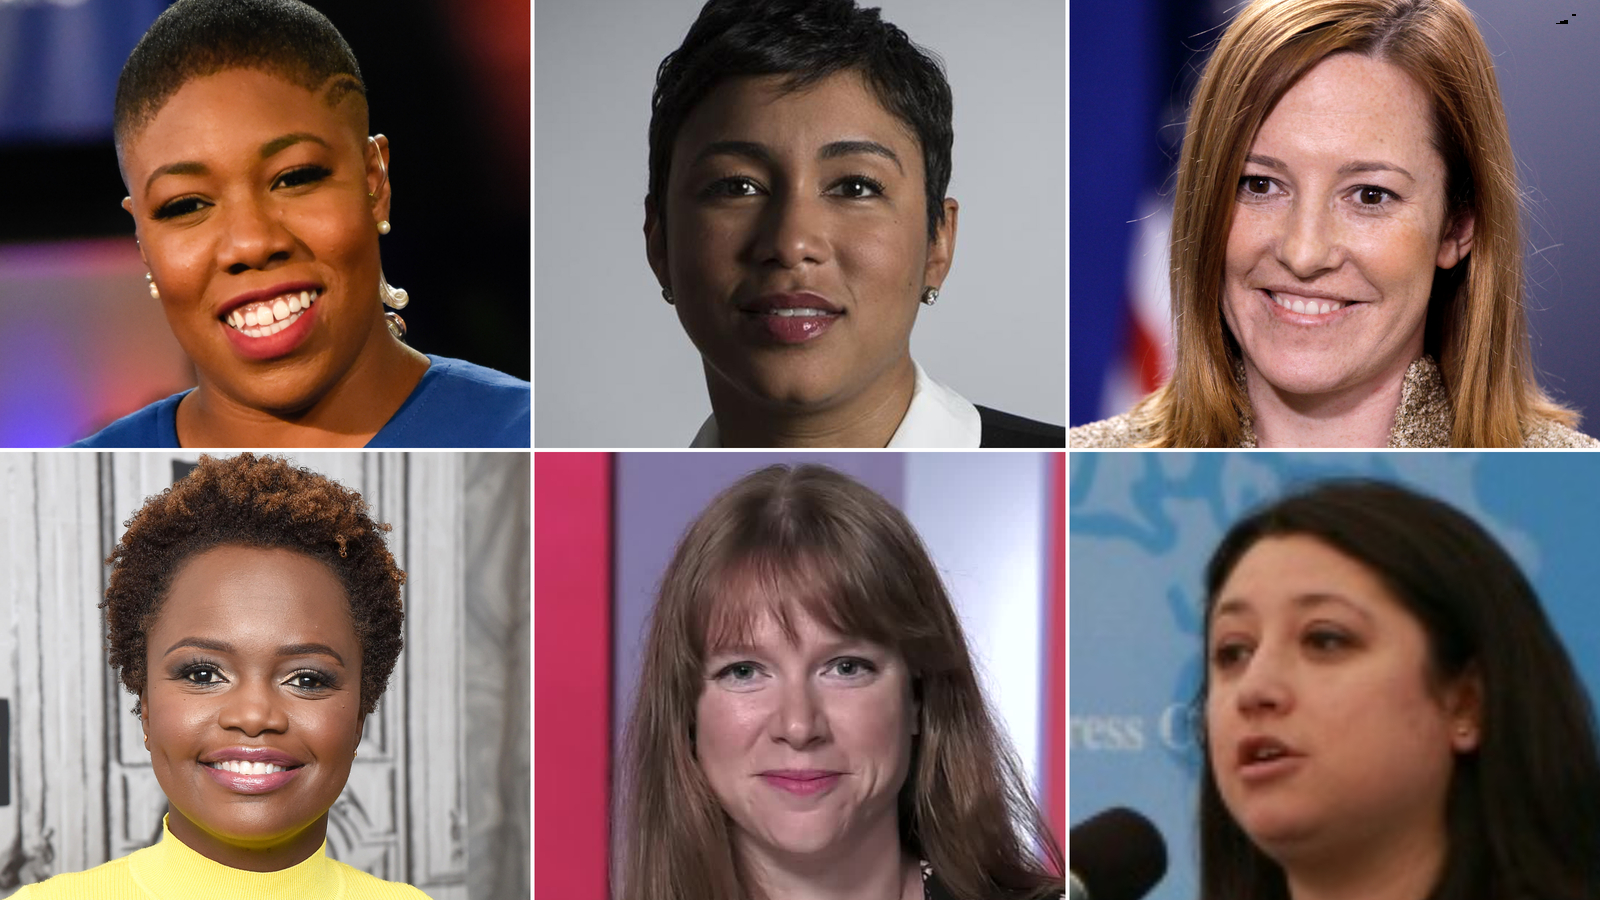 Clockwise from top left: Symone Sanders, Ashley Etienne, Jen Psaki, Pili Tobar, Kate Bedingfield and Karine Jean-Pierre. Not pictured is Elizabeth Alexander.